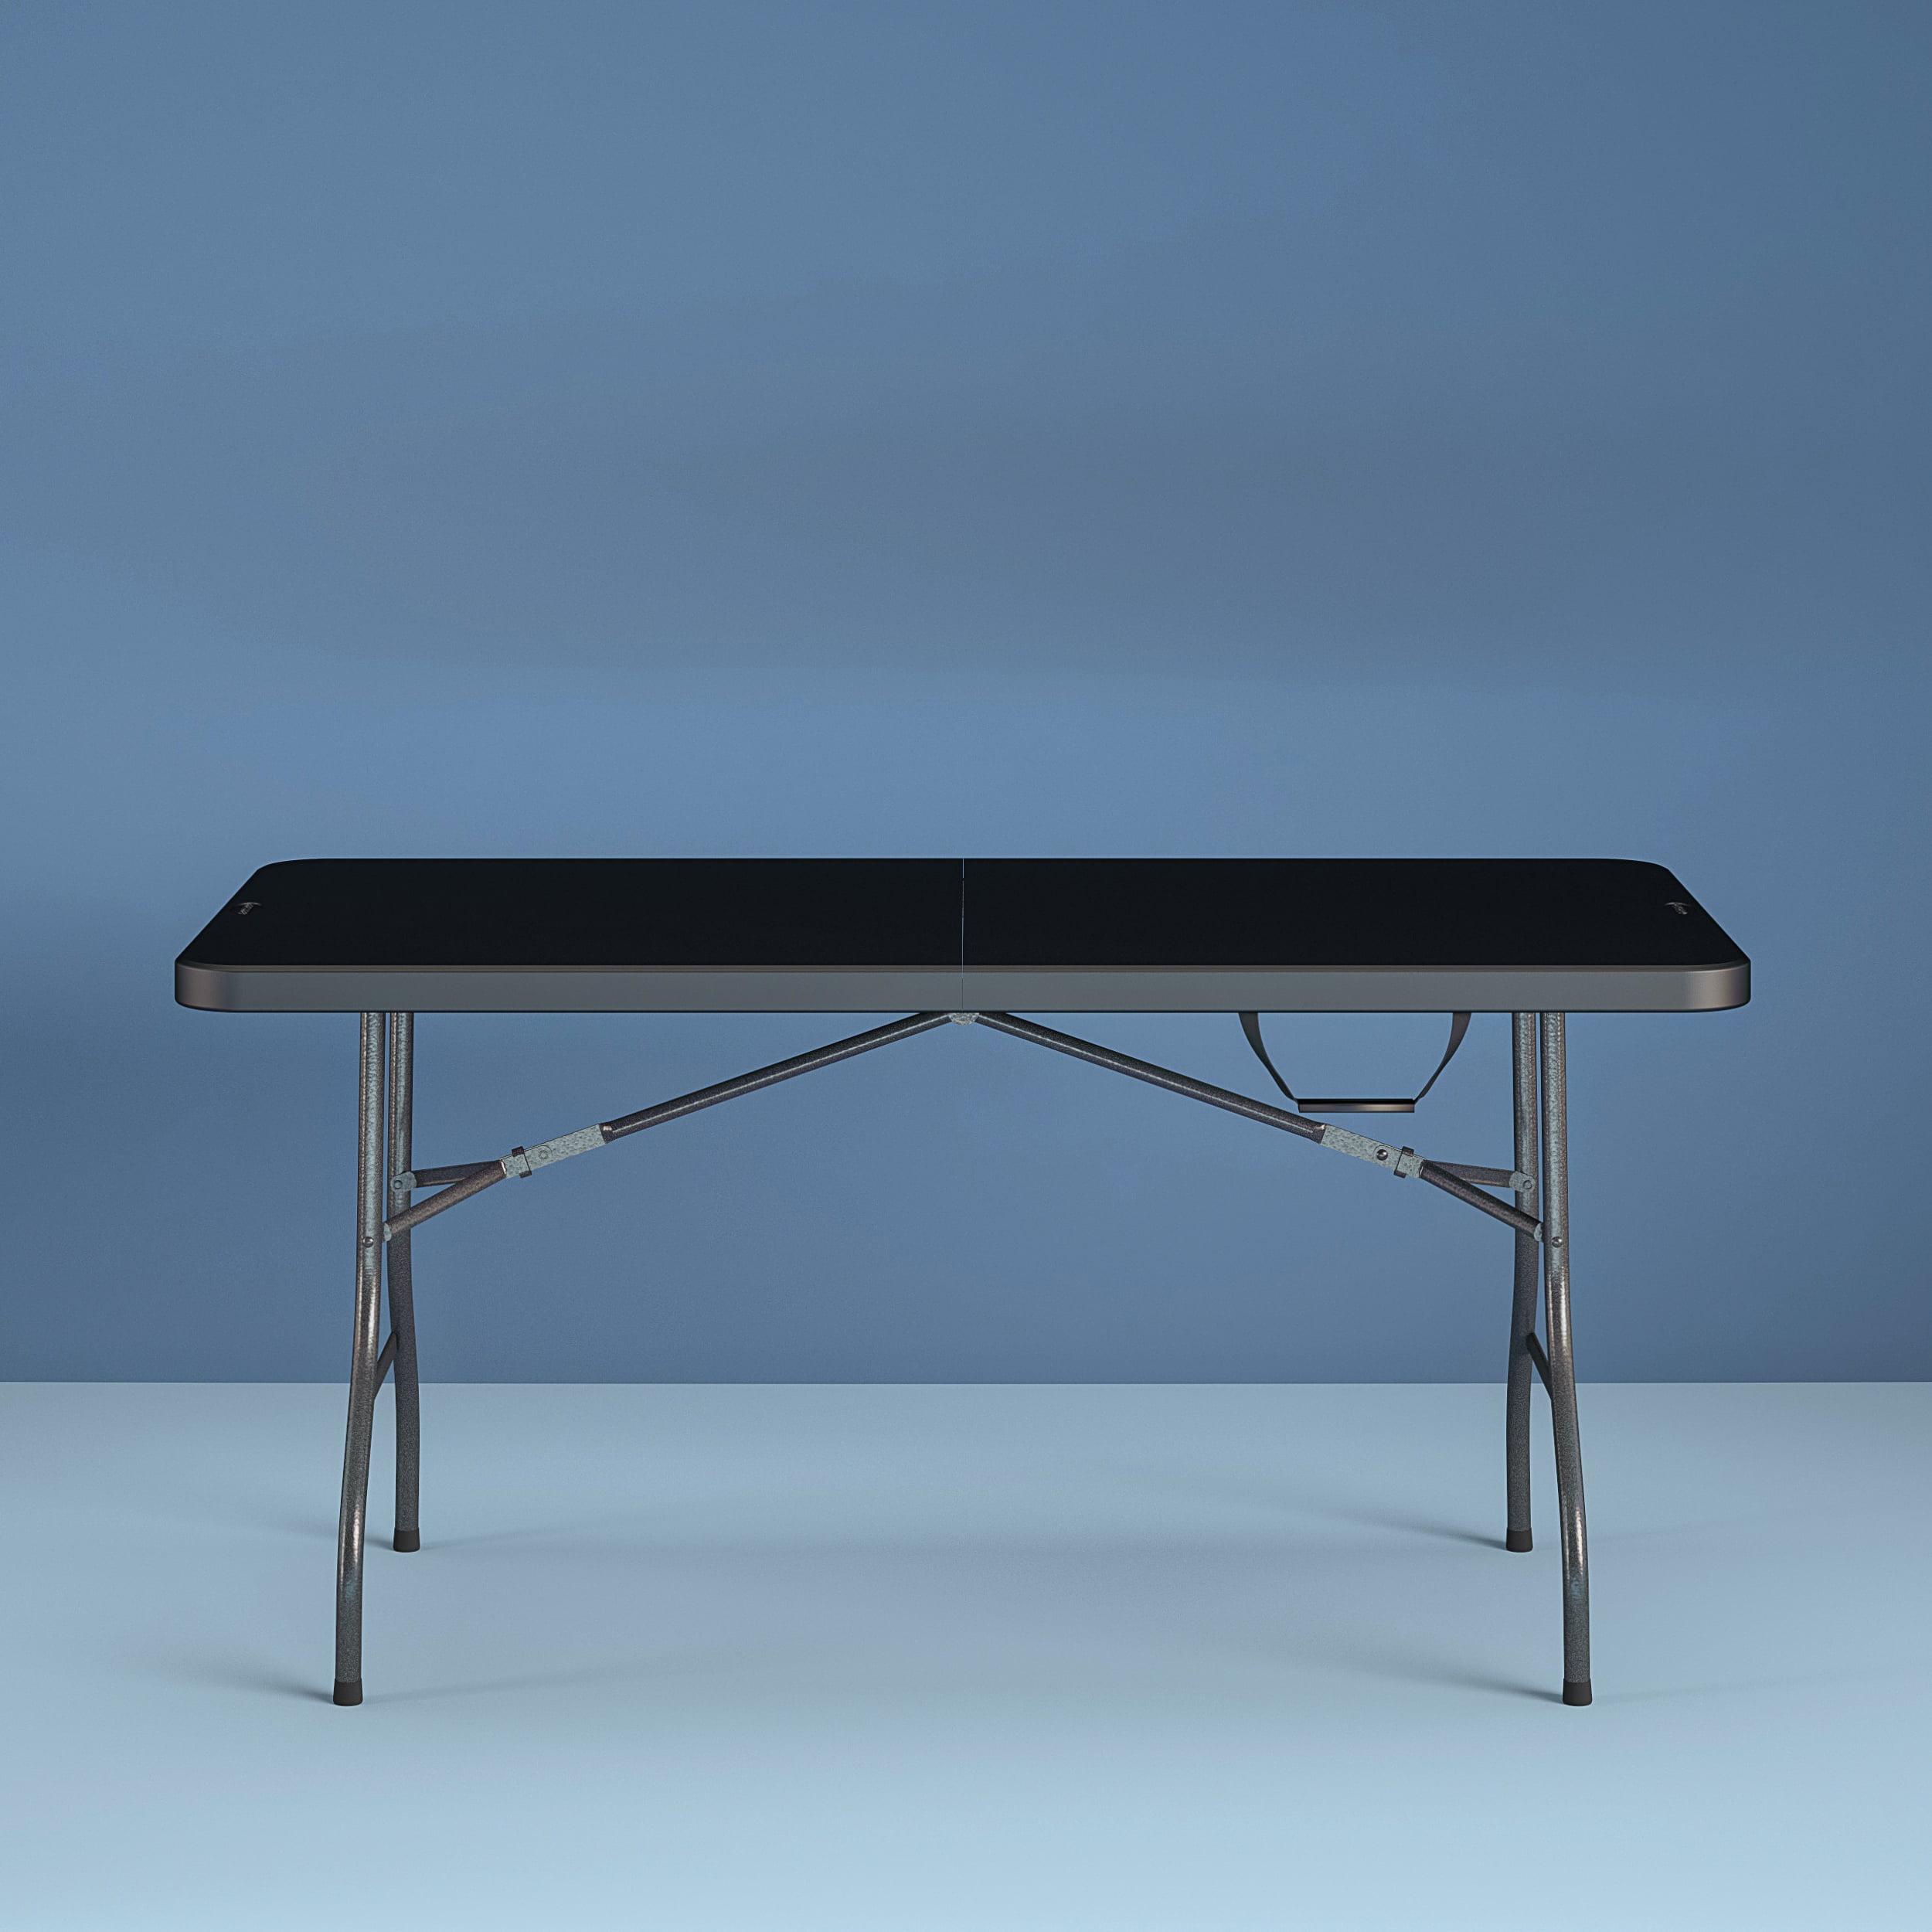 - Cosco 6 Foot Centerfold Folding Table, White - Walmart.com - Walmart.com